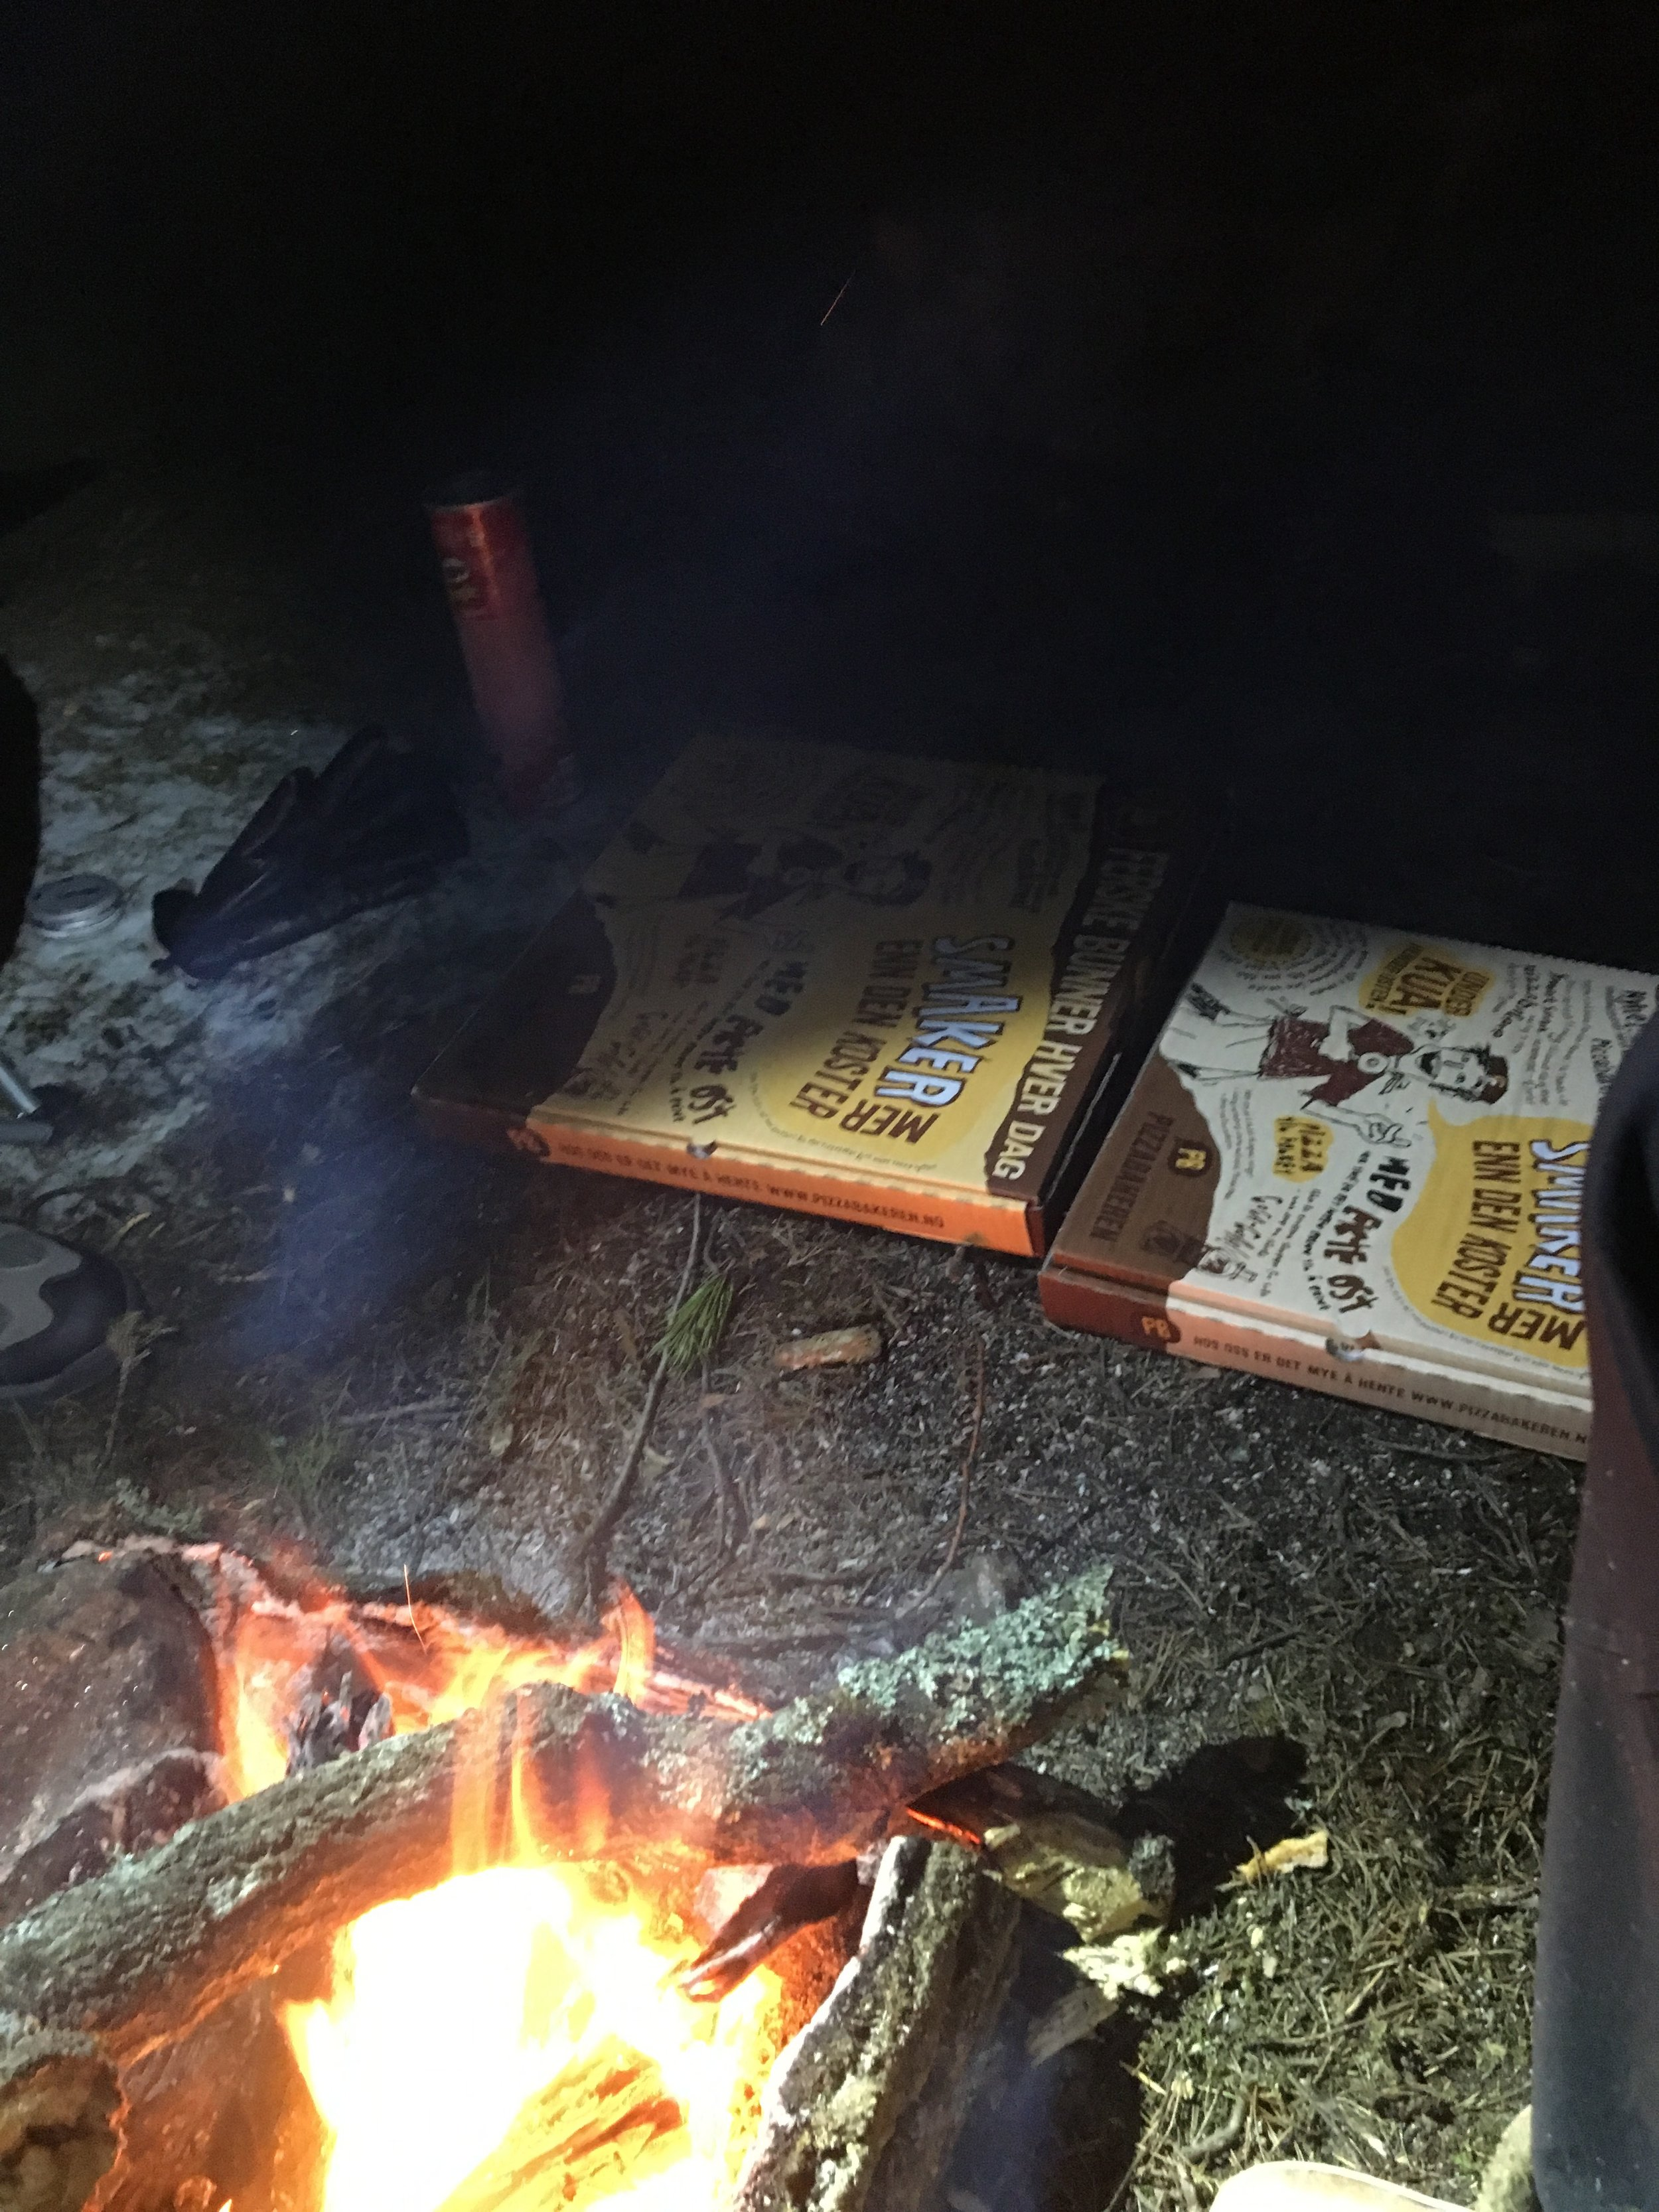 Pizza and a bonfire, perfect!